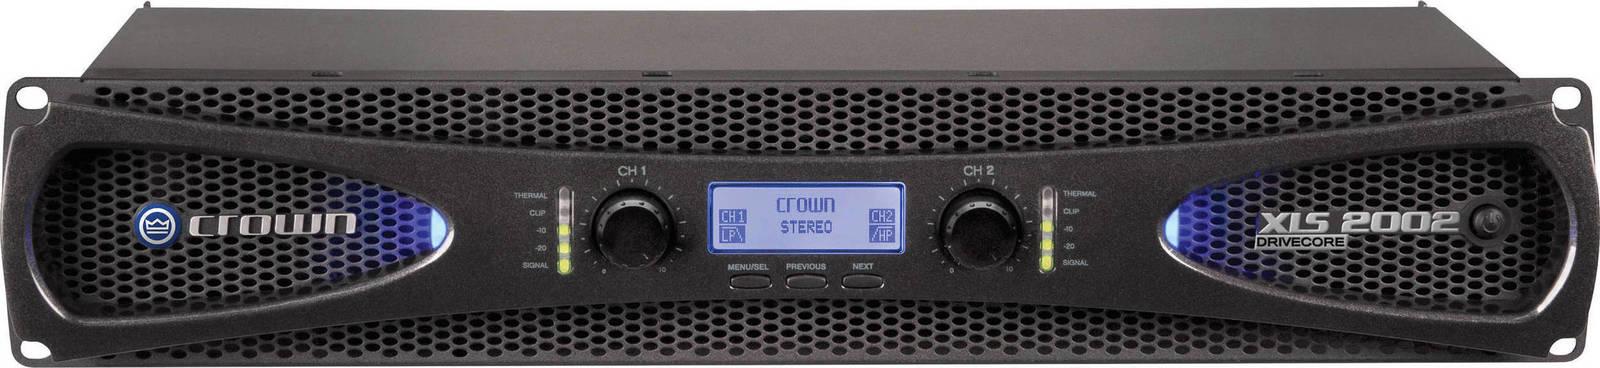 CROWN XLS-2002 Τελικός Ενισχυτής 650W